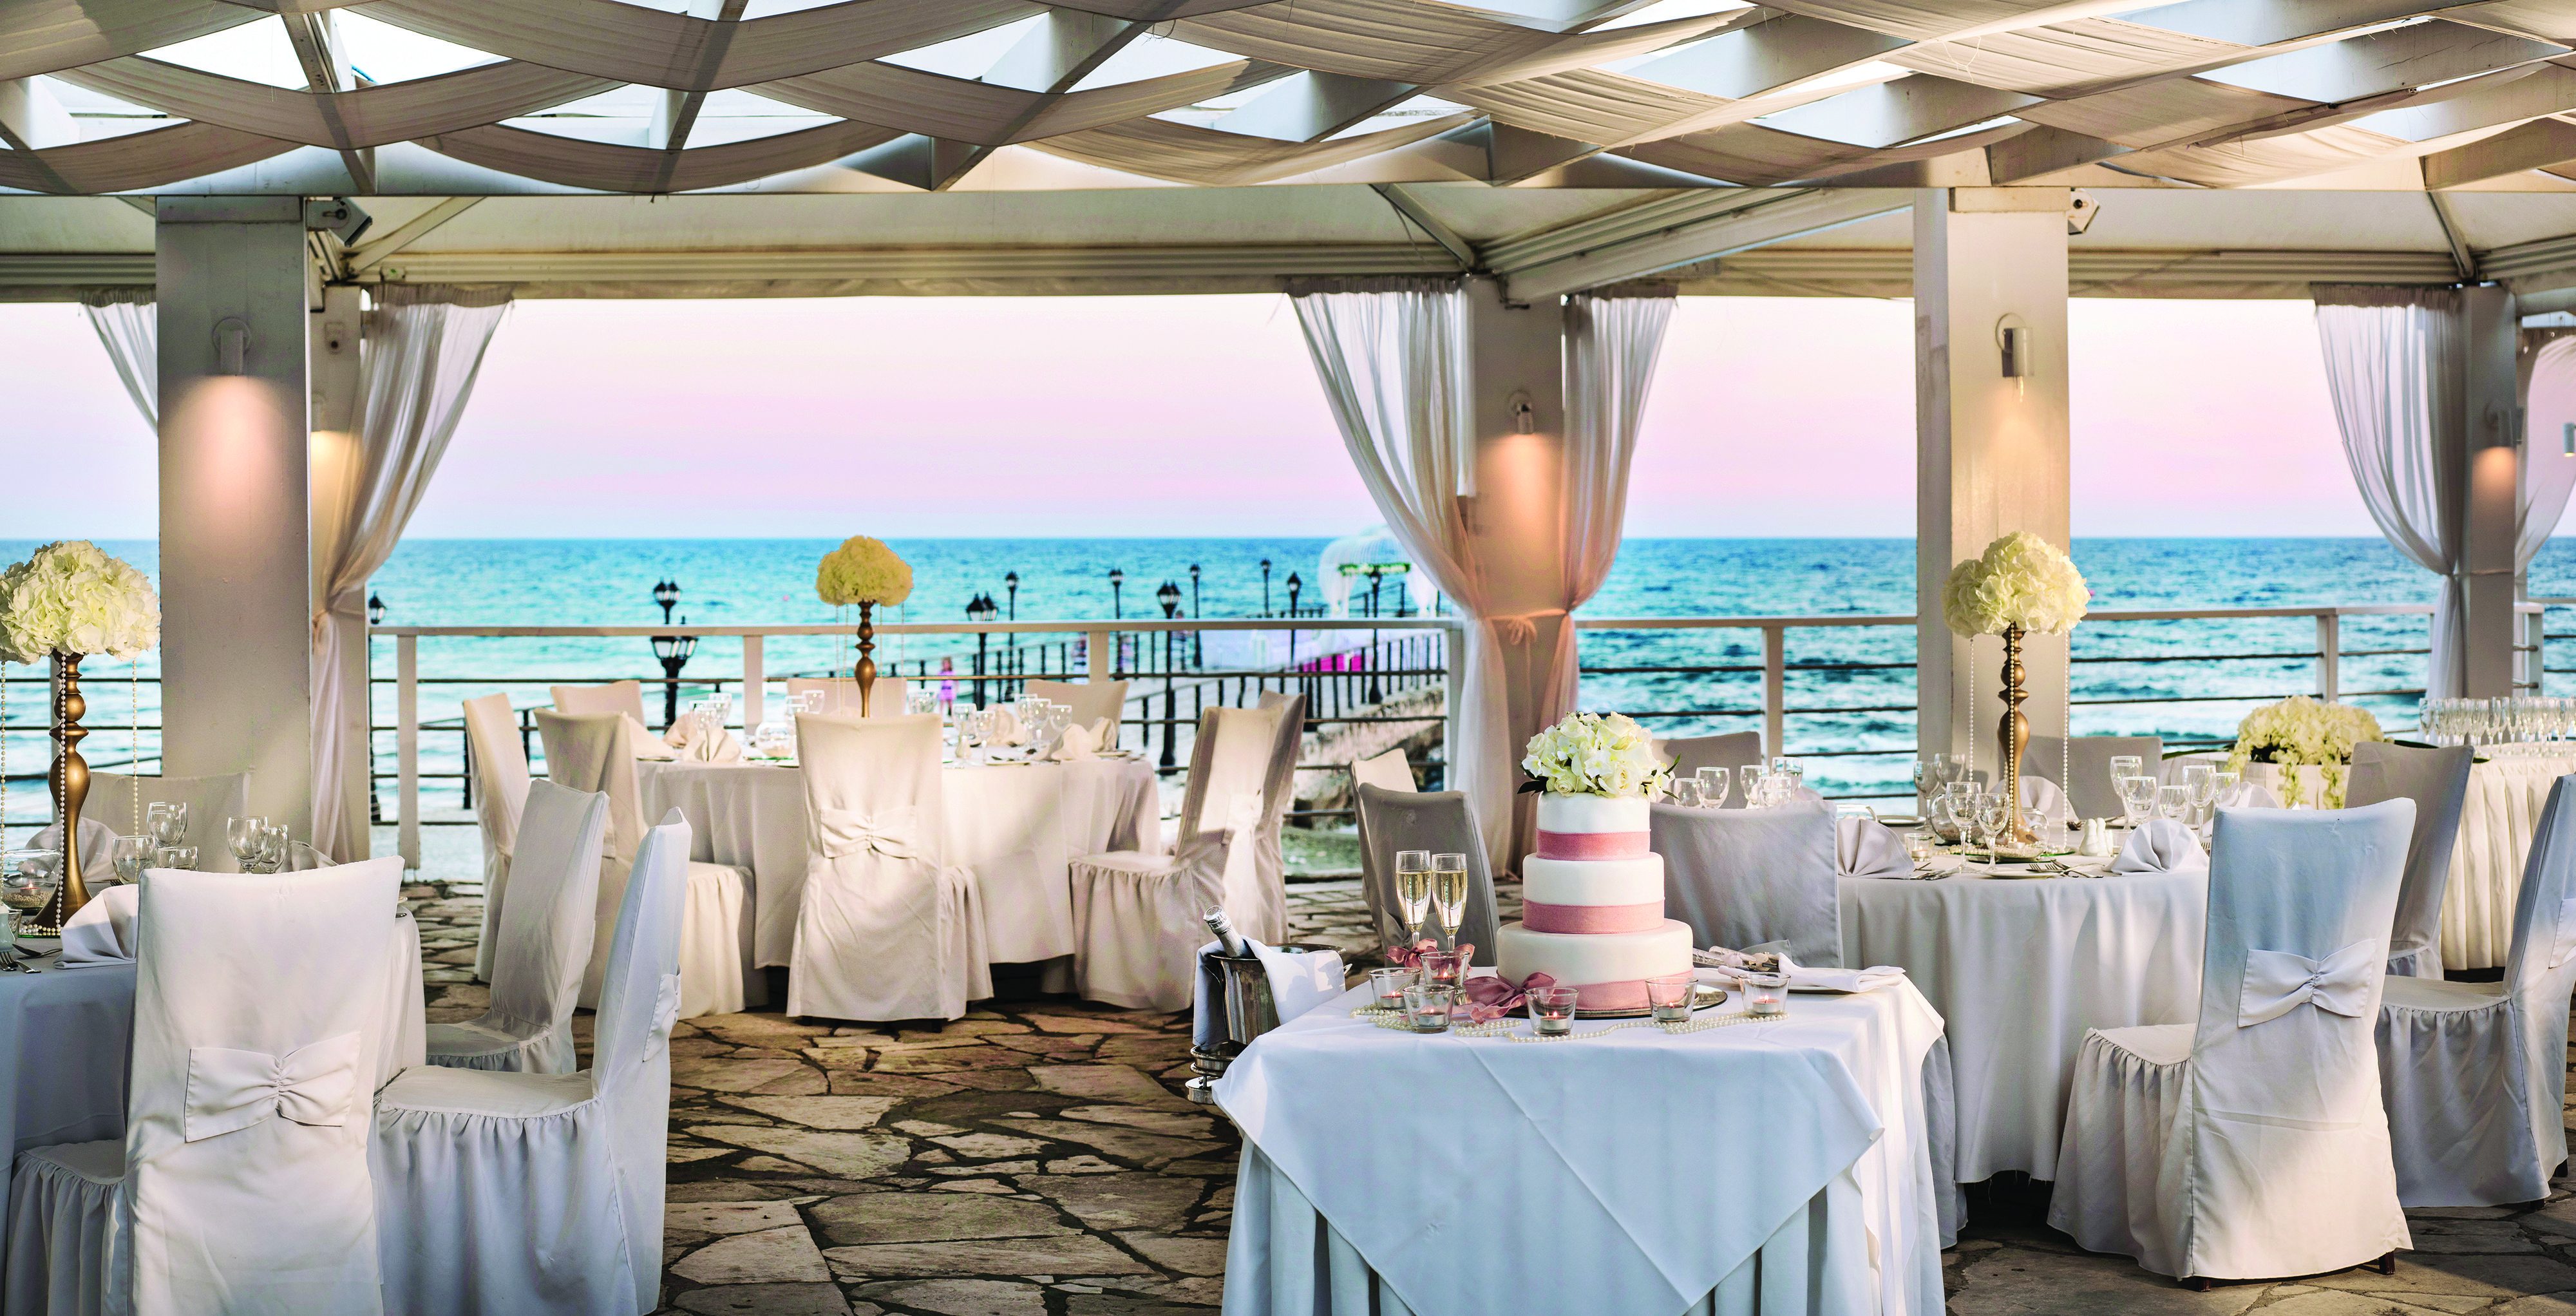 Cyprus Wedding Venue Cyprus Wedding Cyprus Wedding Venues Wedding Planner Uk